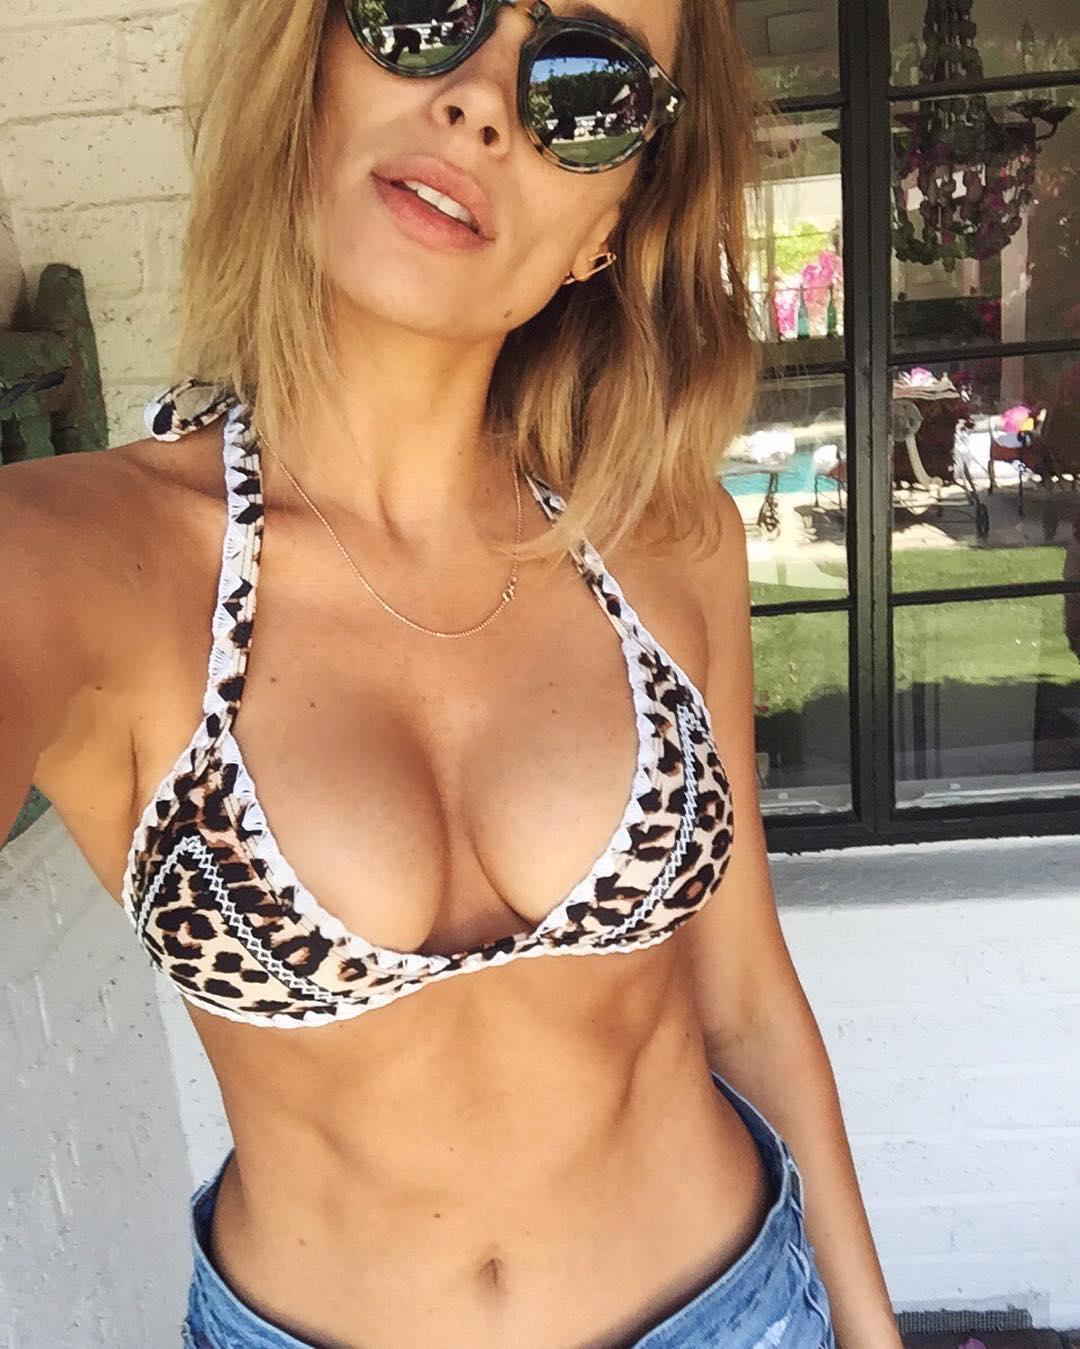 Arielle Vandenberg leaked naked pics